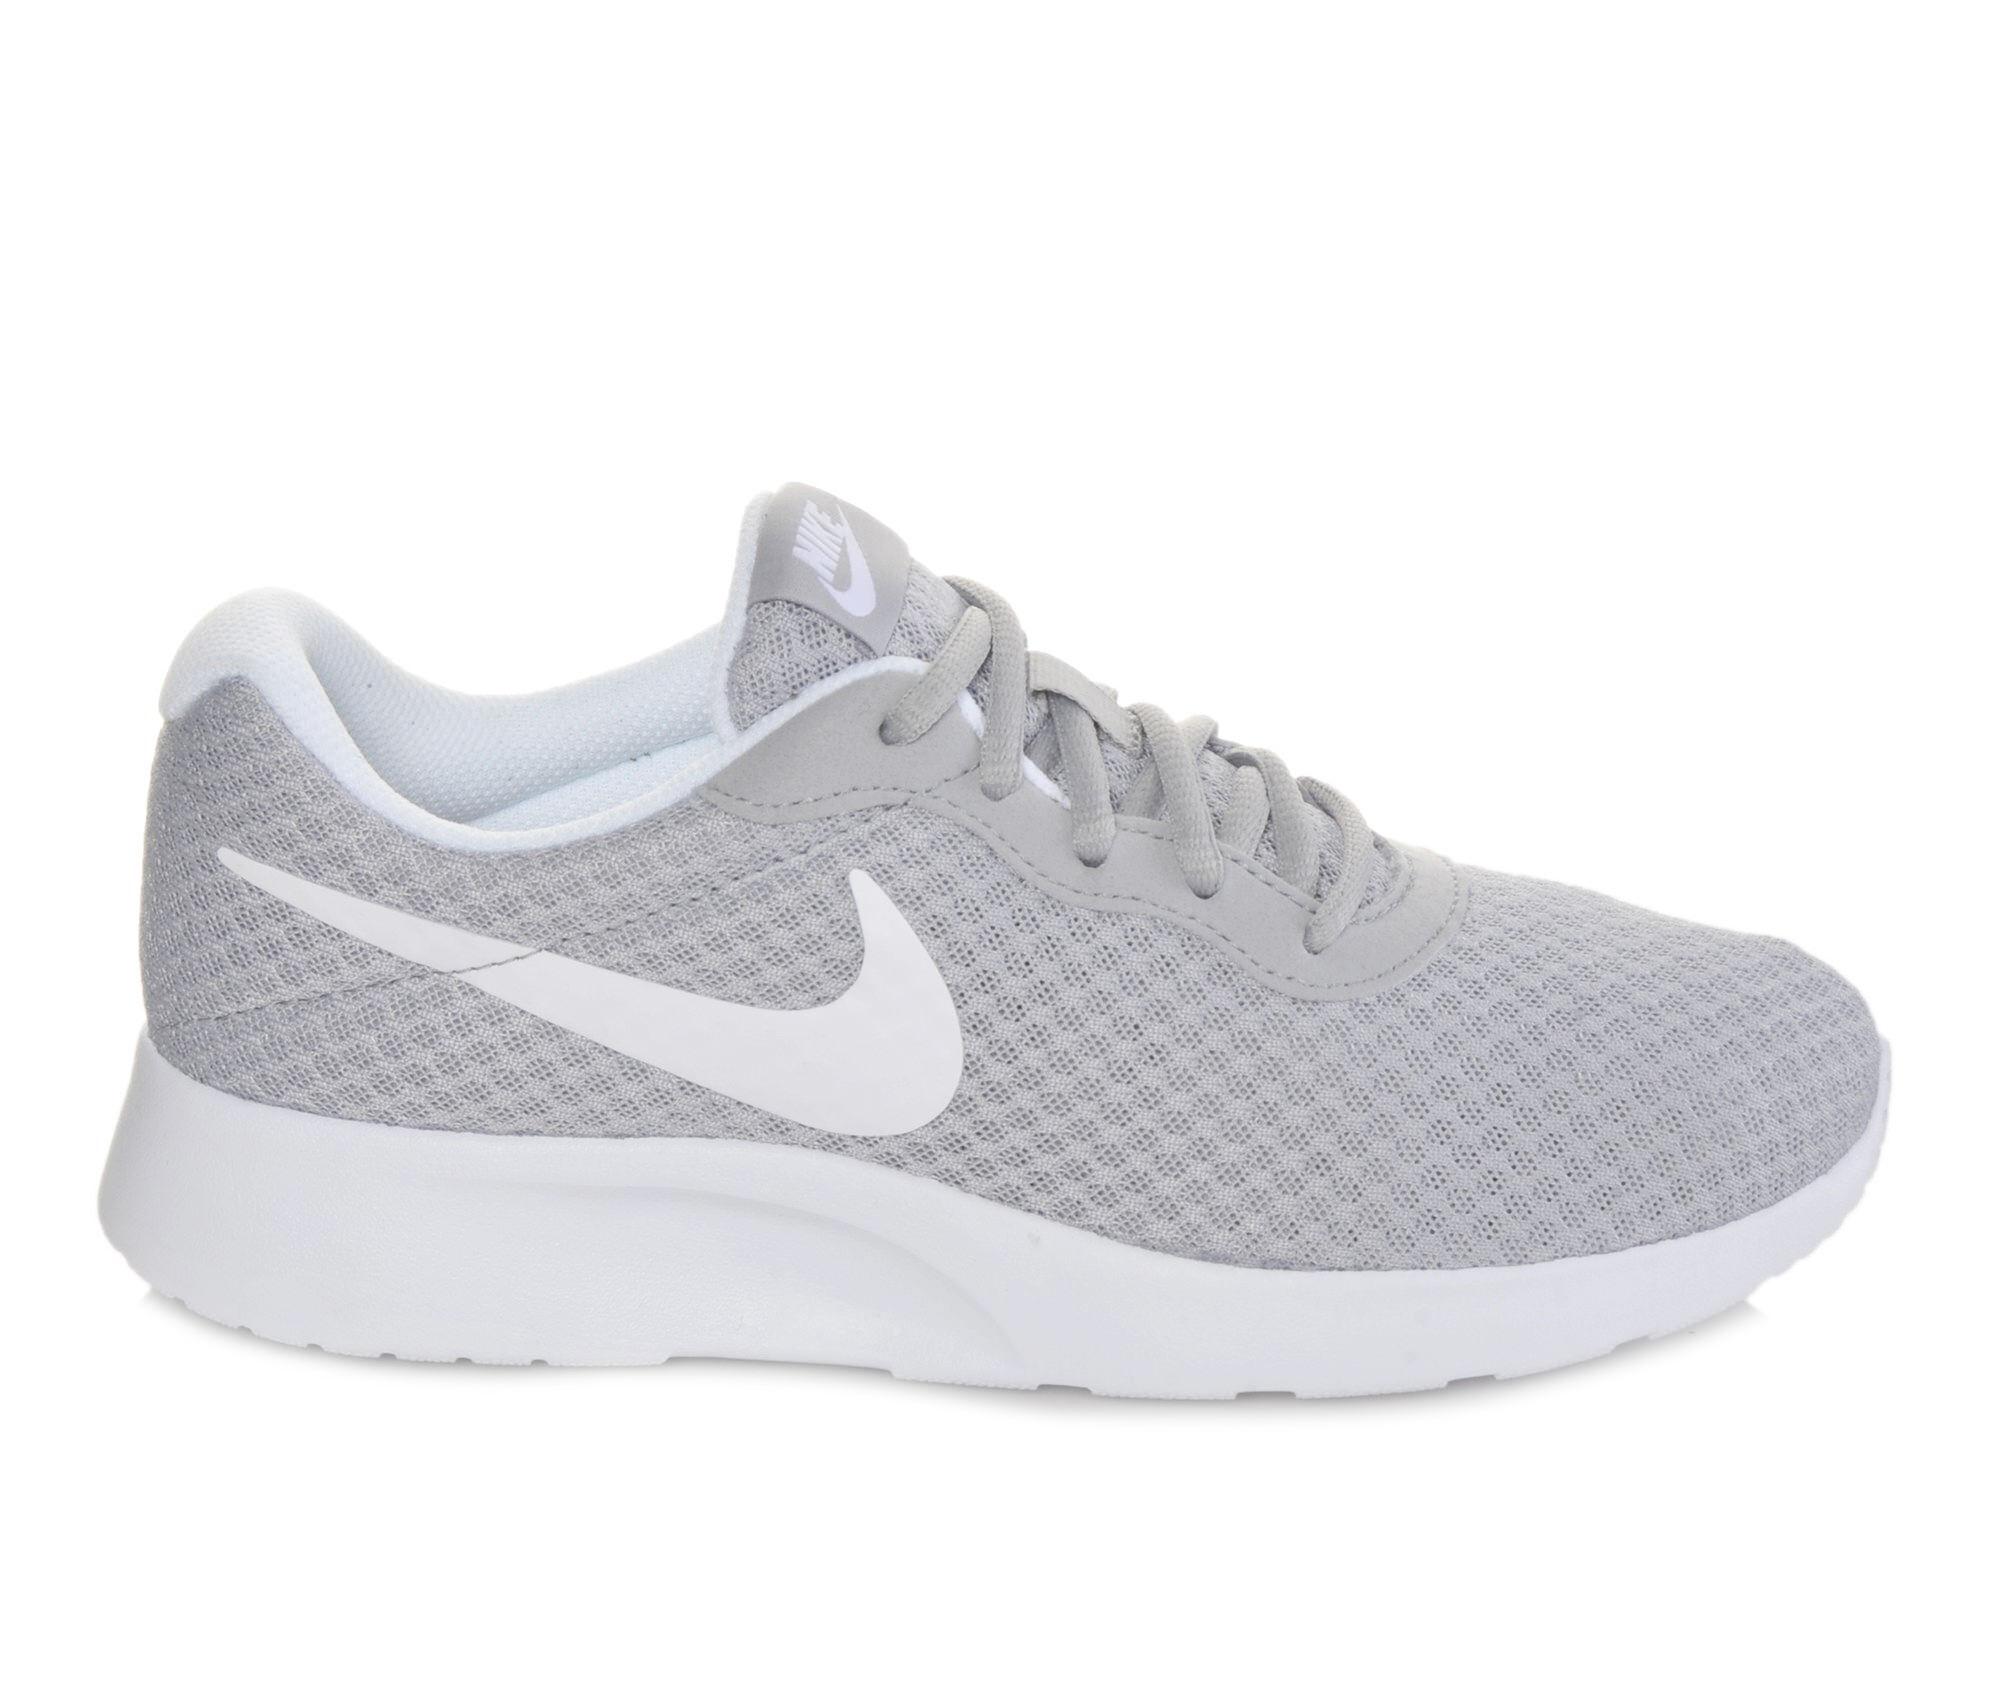 Women's Nike Tanjun Sneakers Grey/White